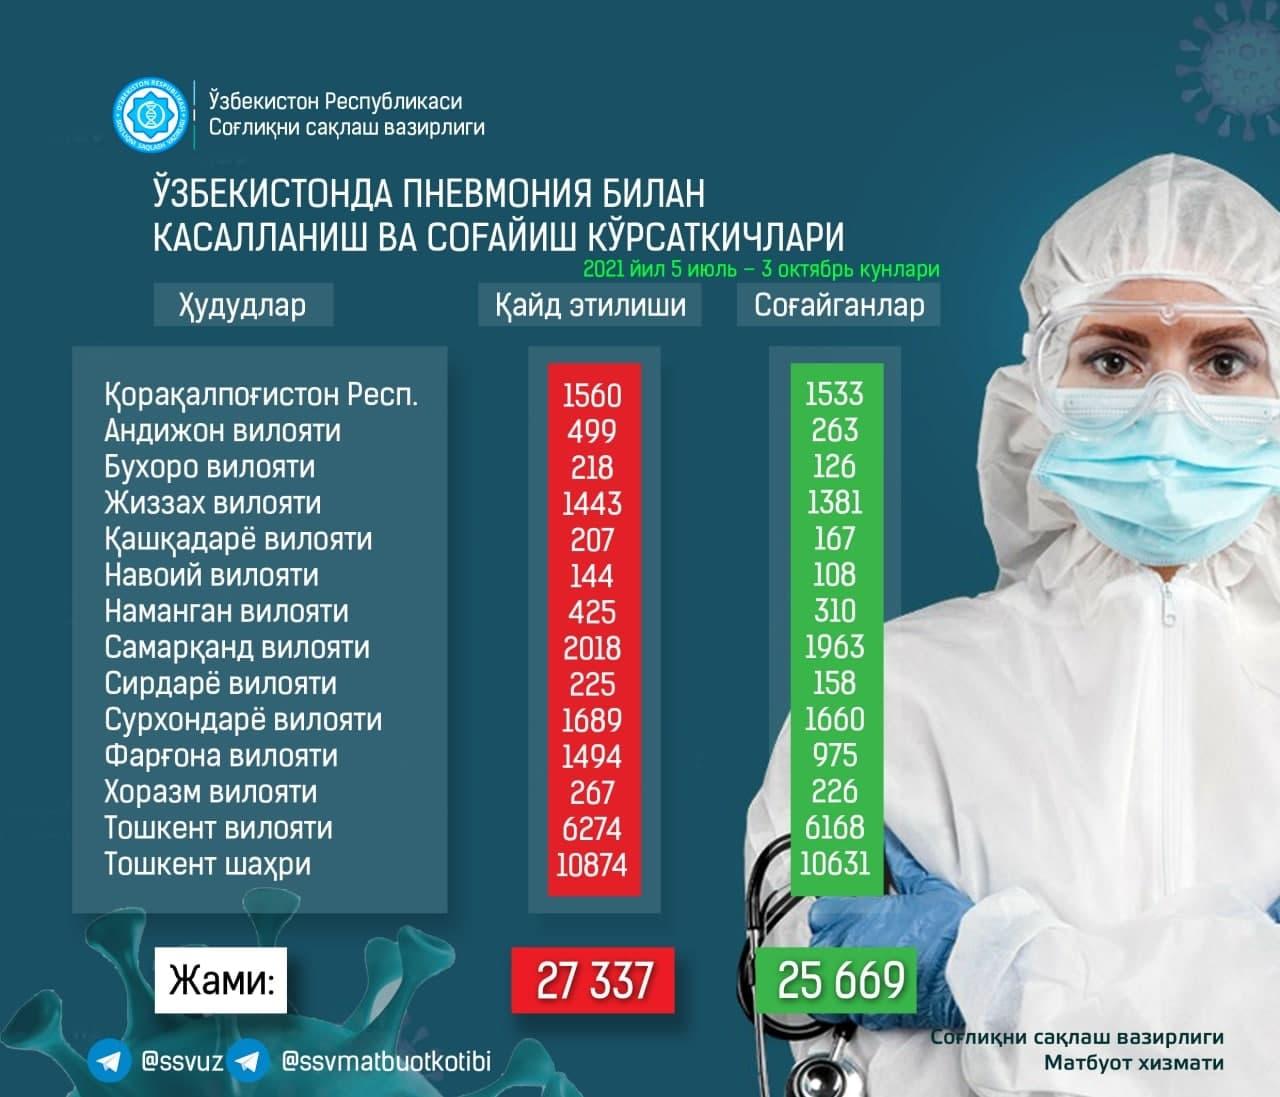 Меньше сорока человек заразились пневмонией за сутки — статистика